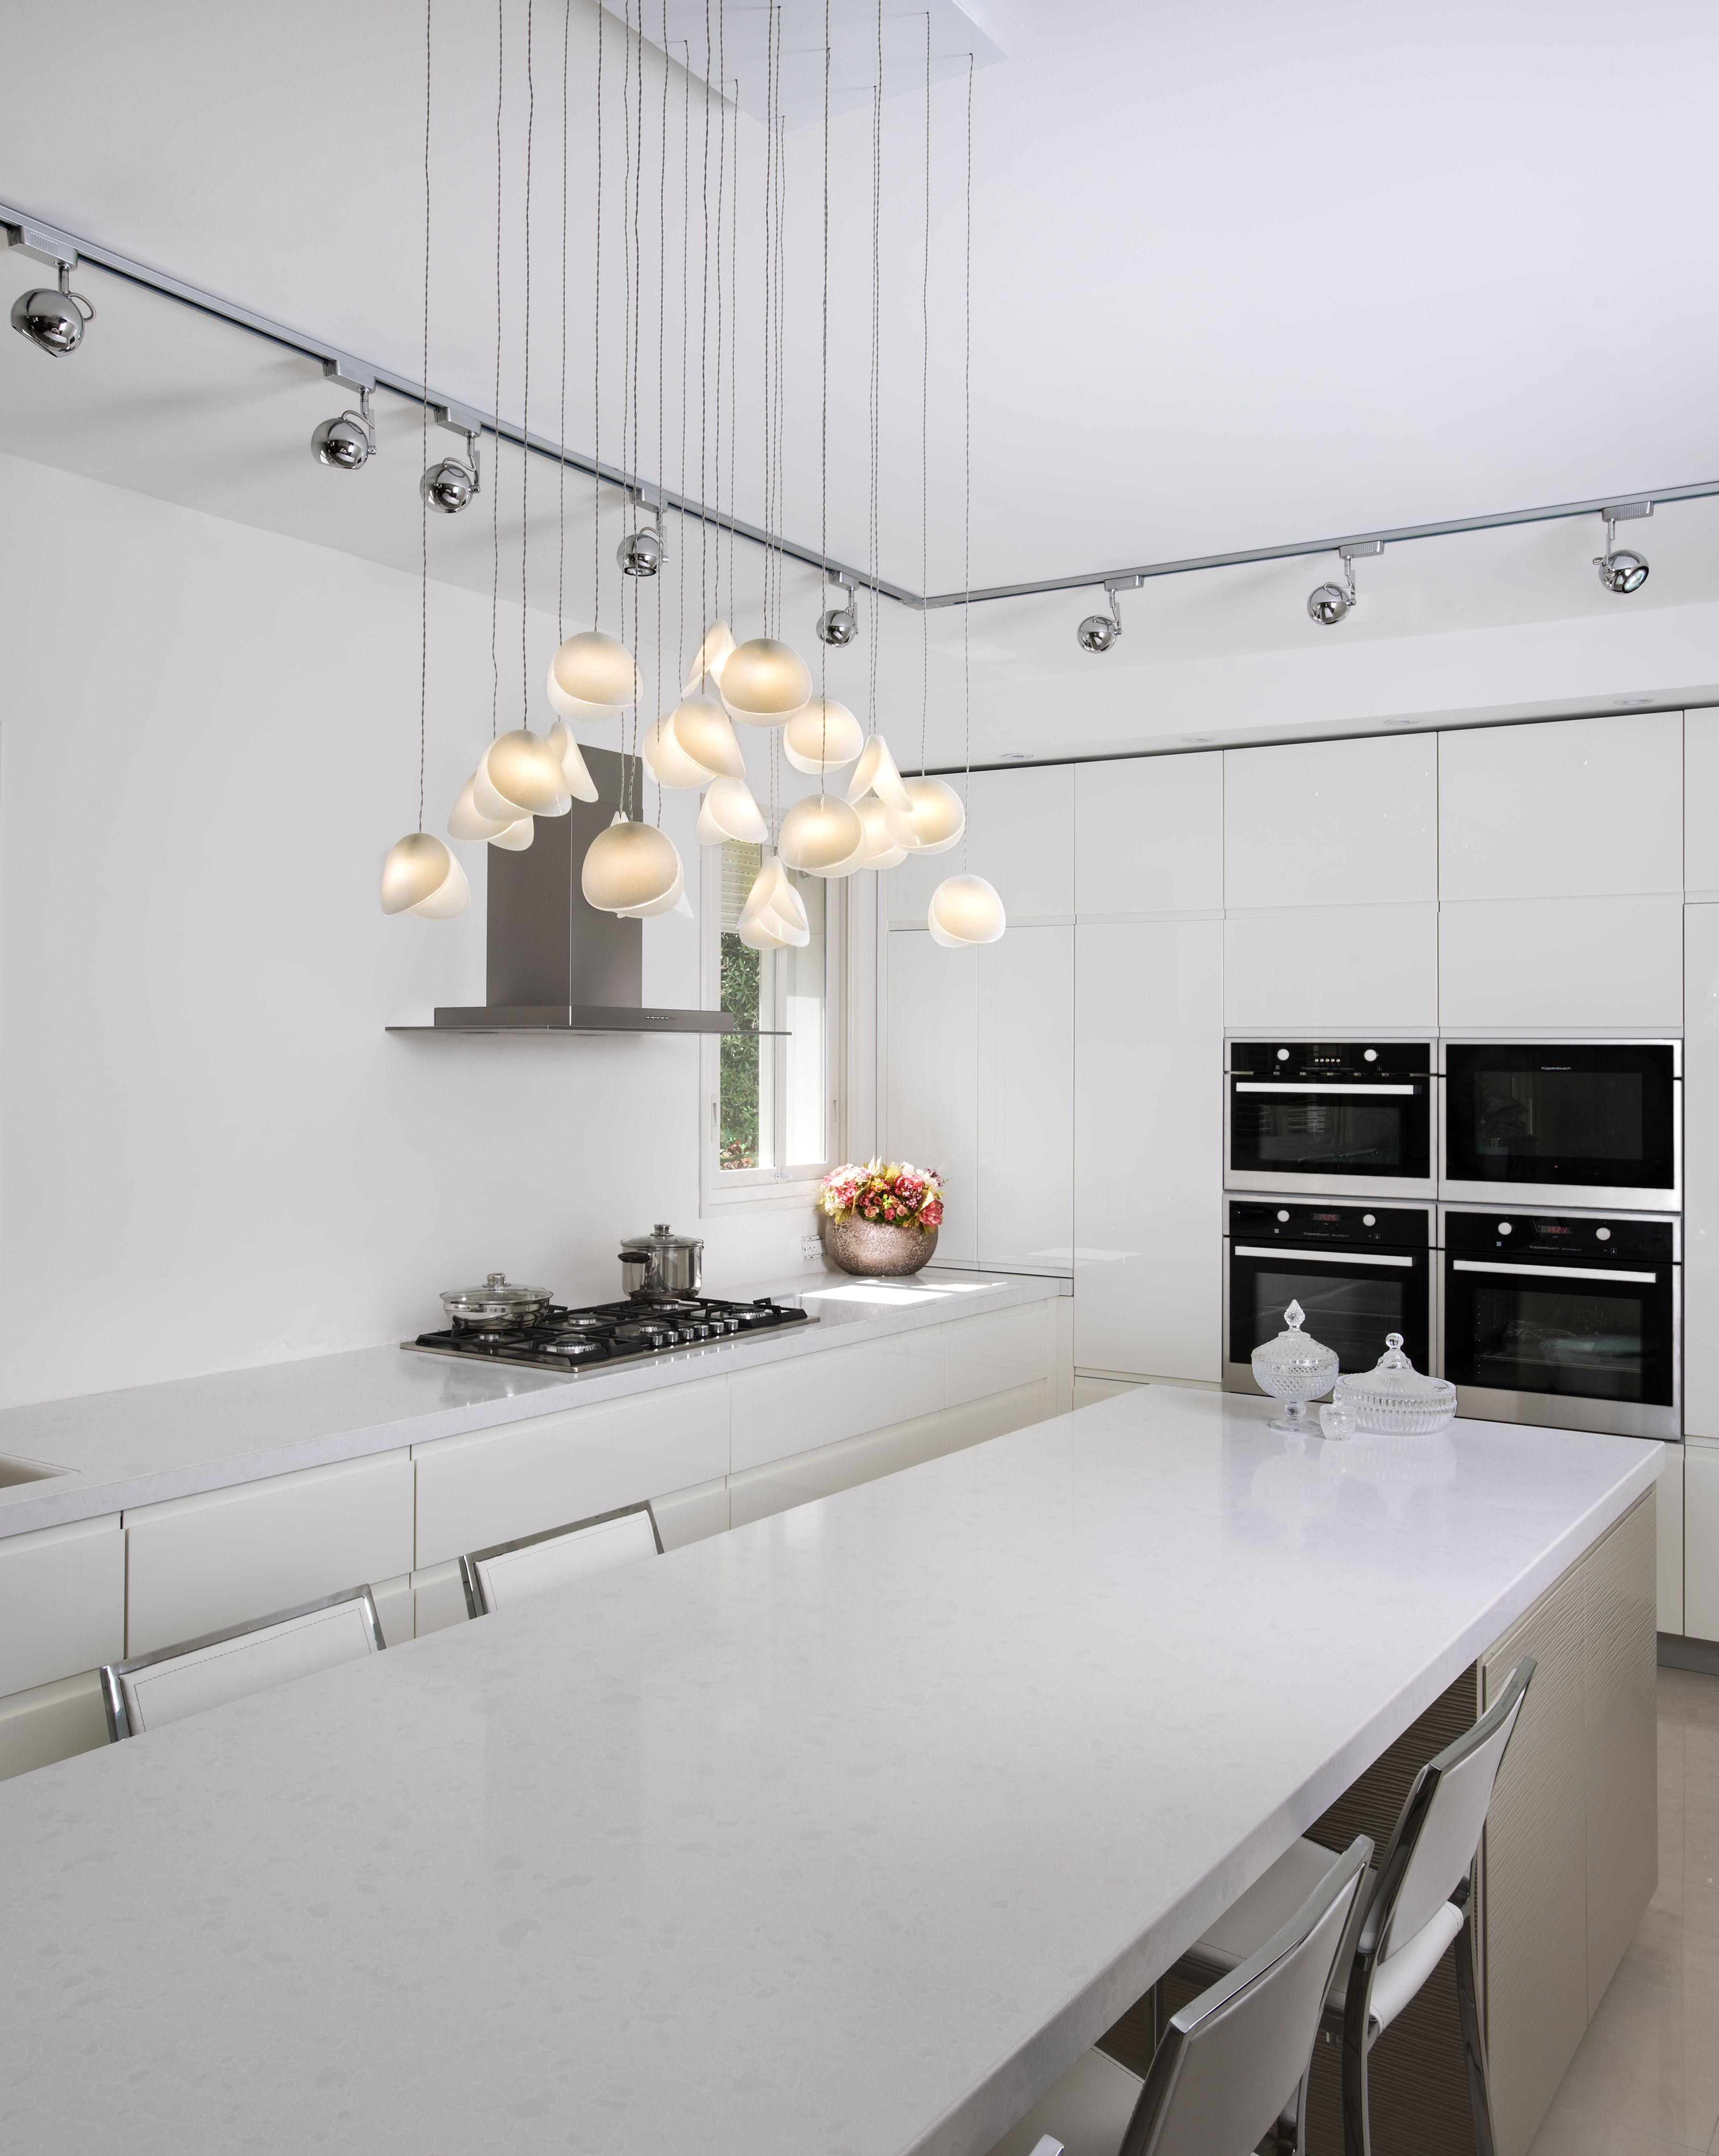 Modern kitchen interior design inspiration pendant lighting over